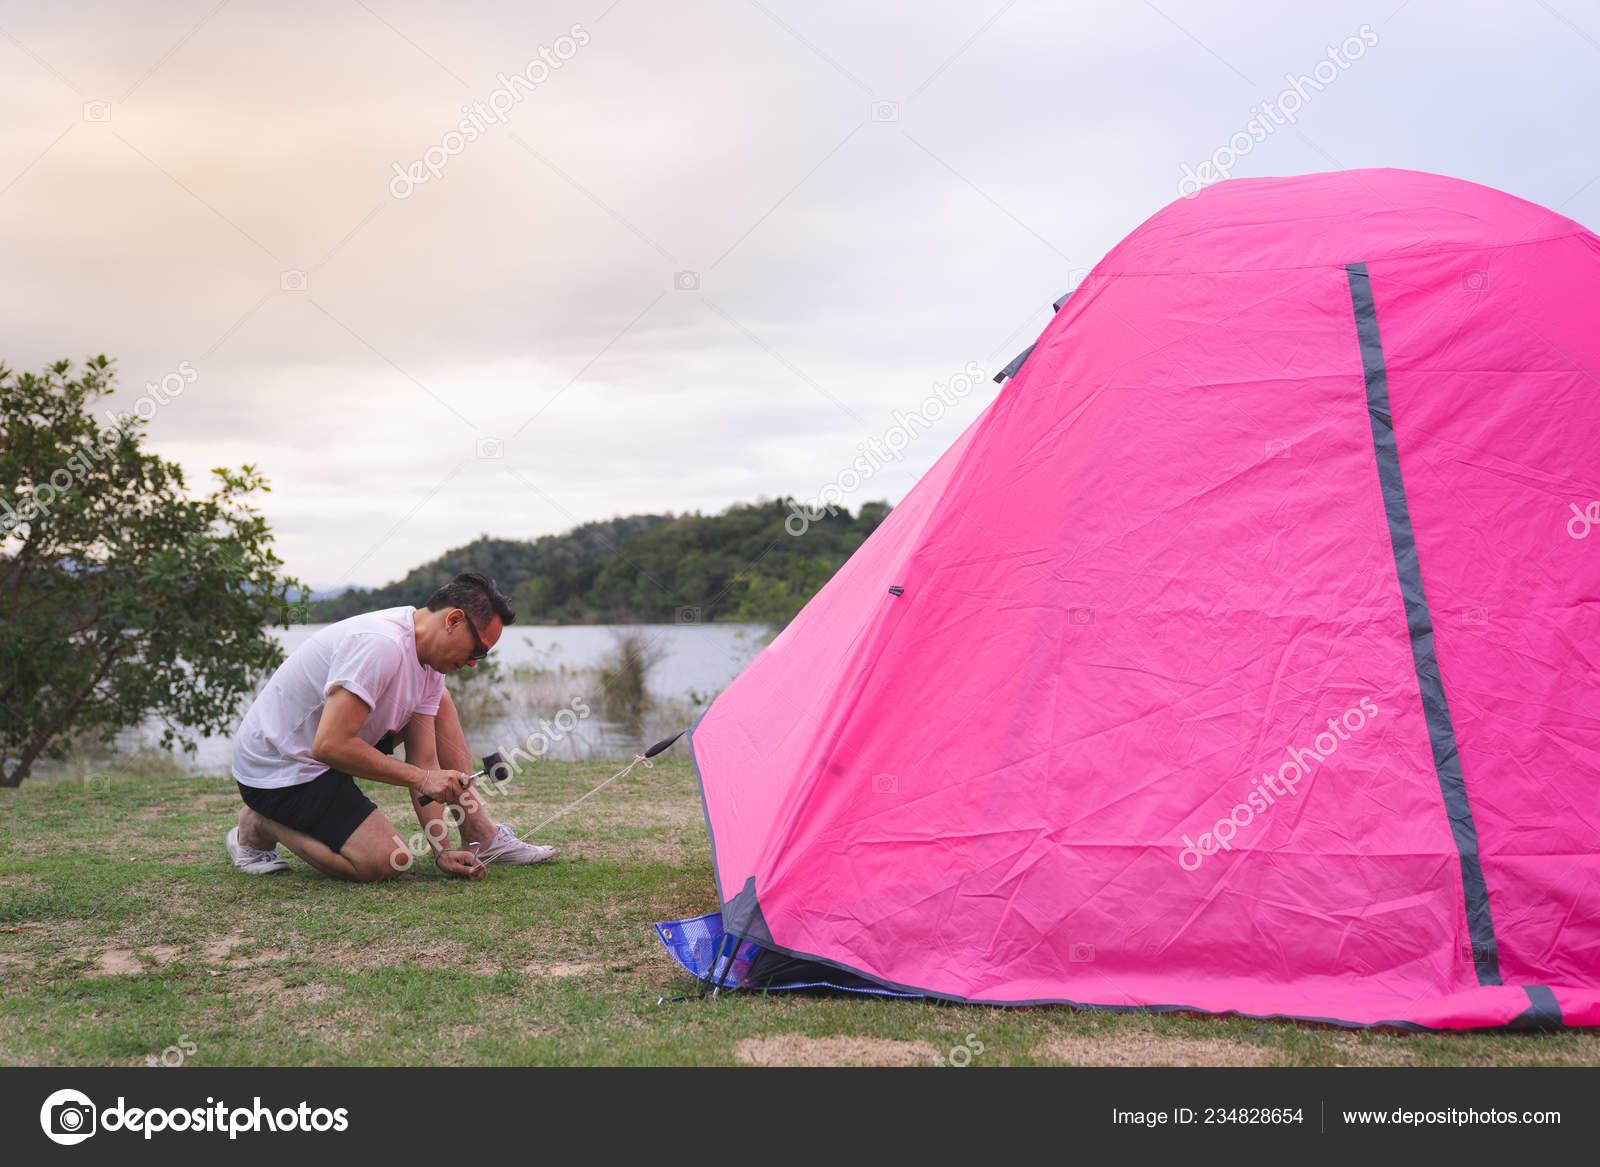 An Asian man in white t shirt setting pink tent at c&groundu2013 stock image & Asian Man White Shirt Setting Pink Tent Campground u2014 Stock Photo ...